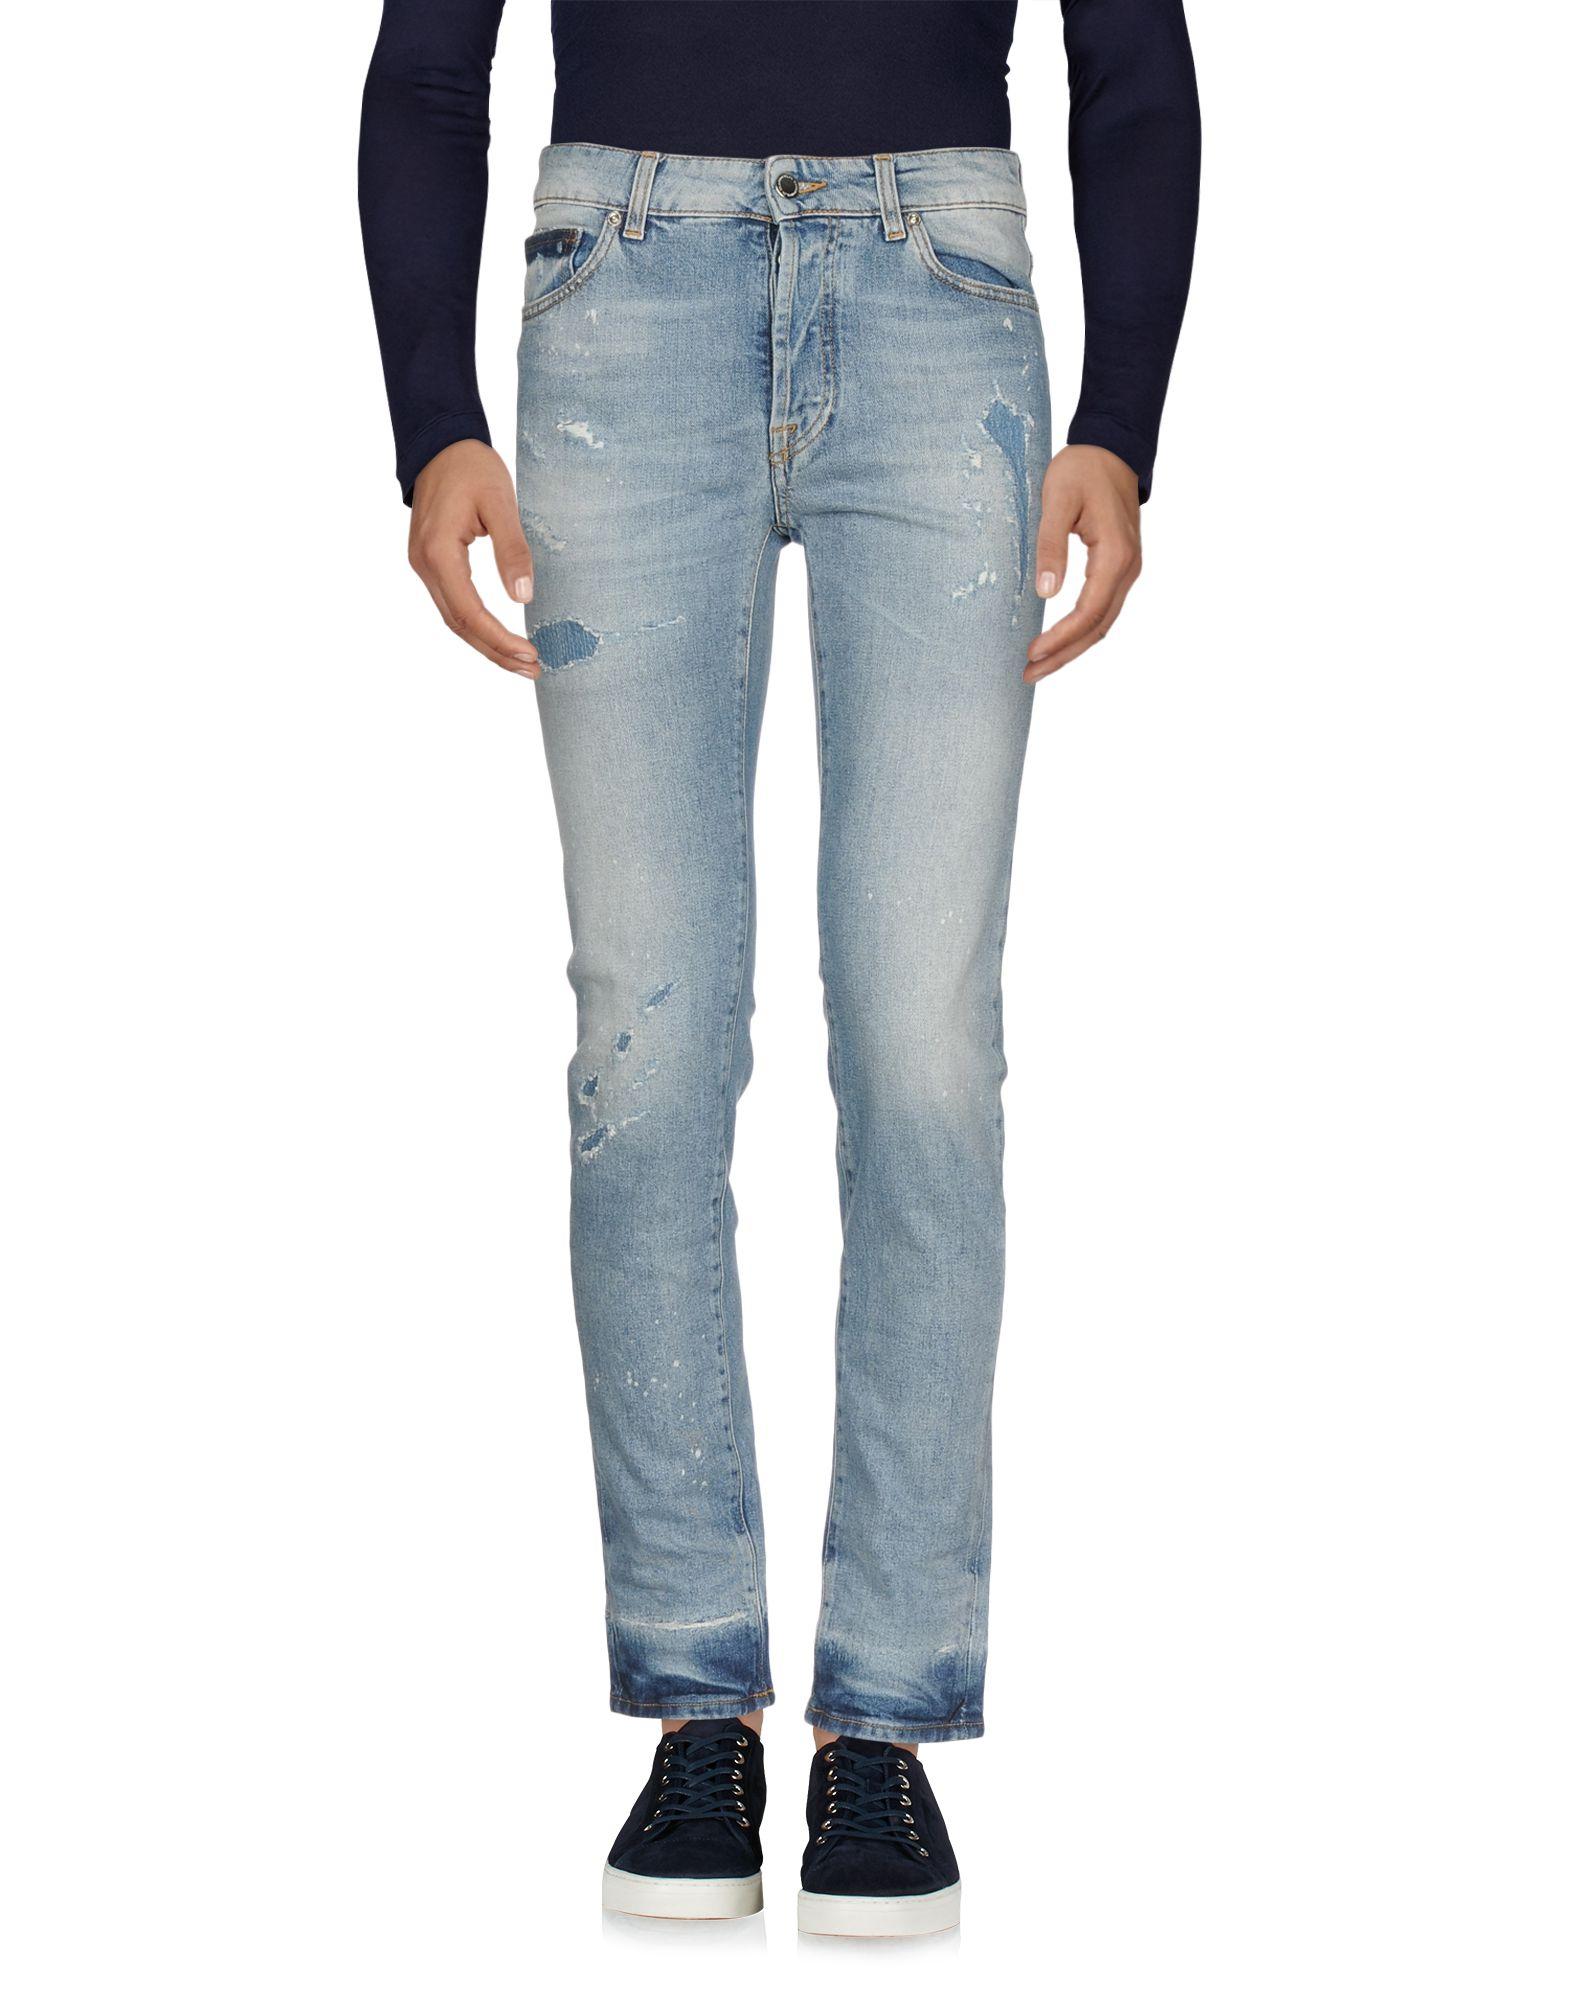 Pantaloni Jeans Marcelo Burlon Donna - Acquista online su